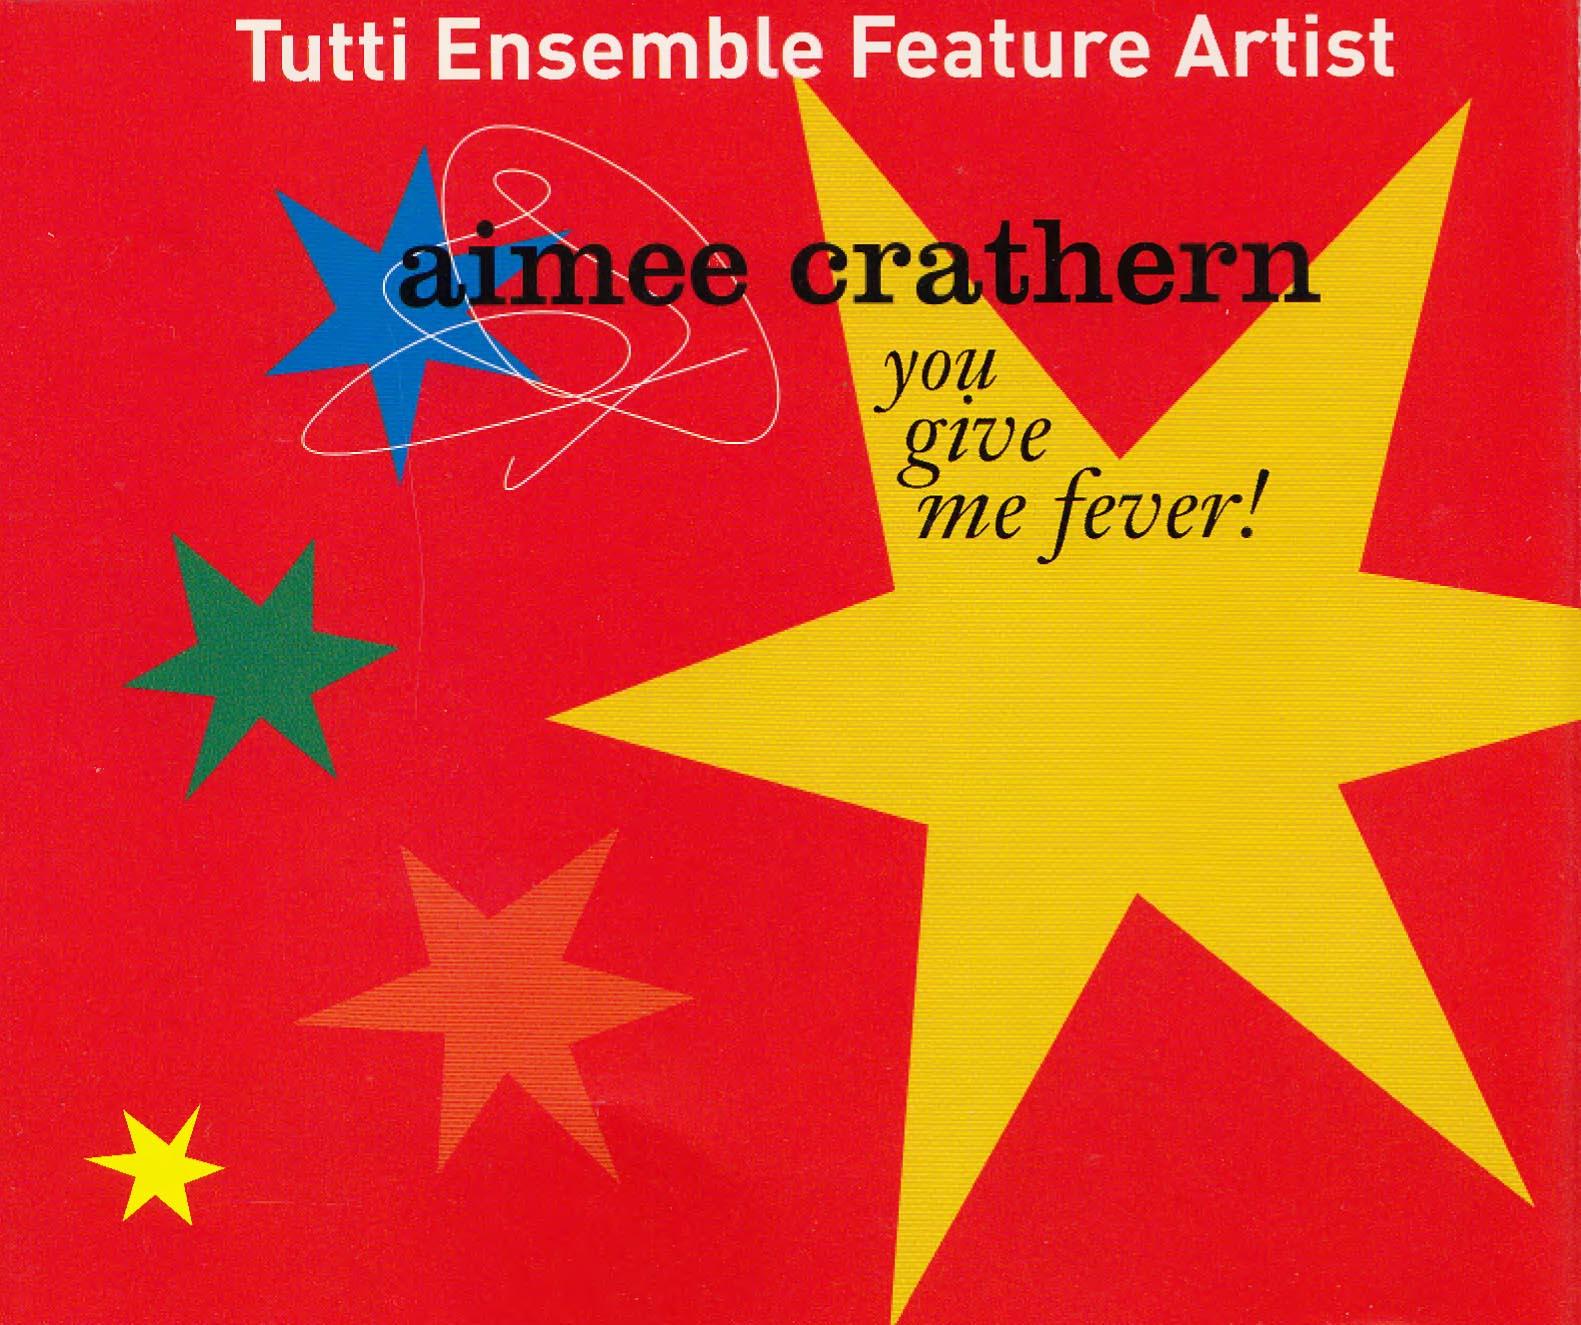 Tutti_CD_covers_Aimee.jpg